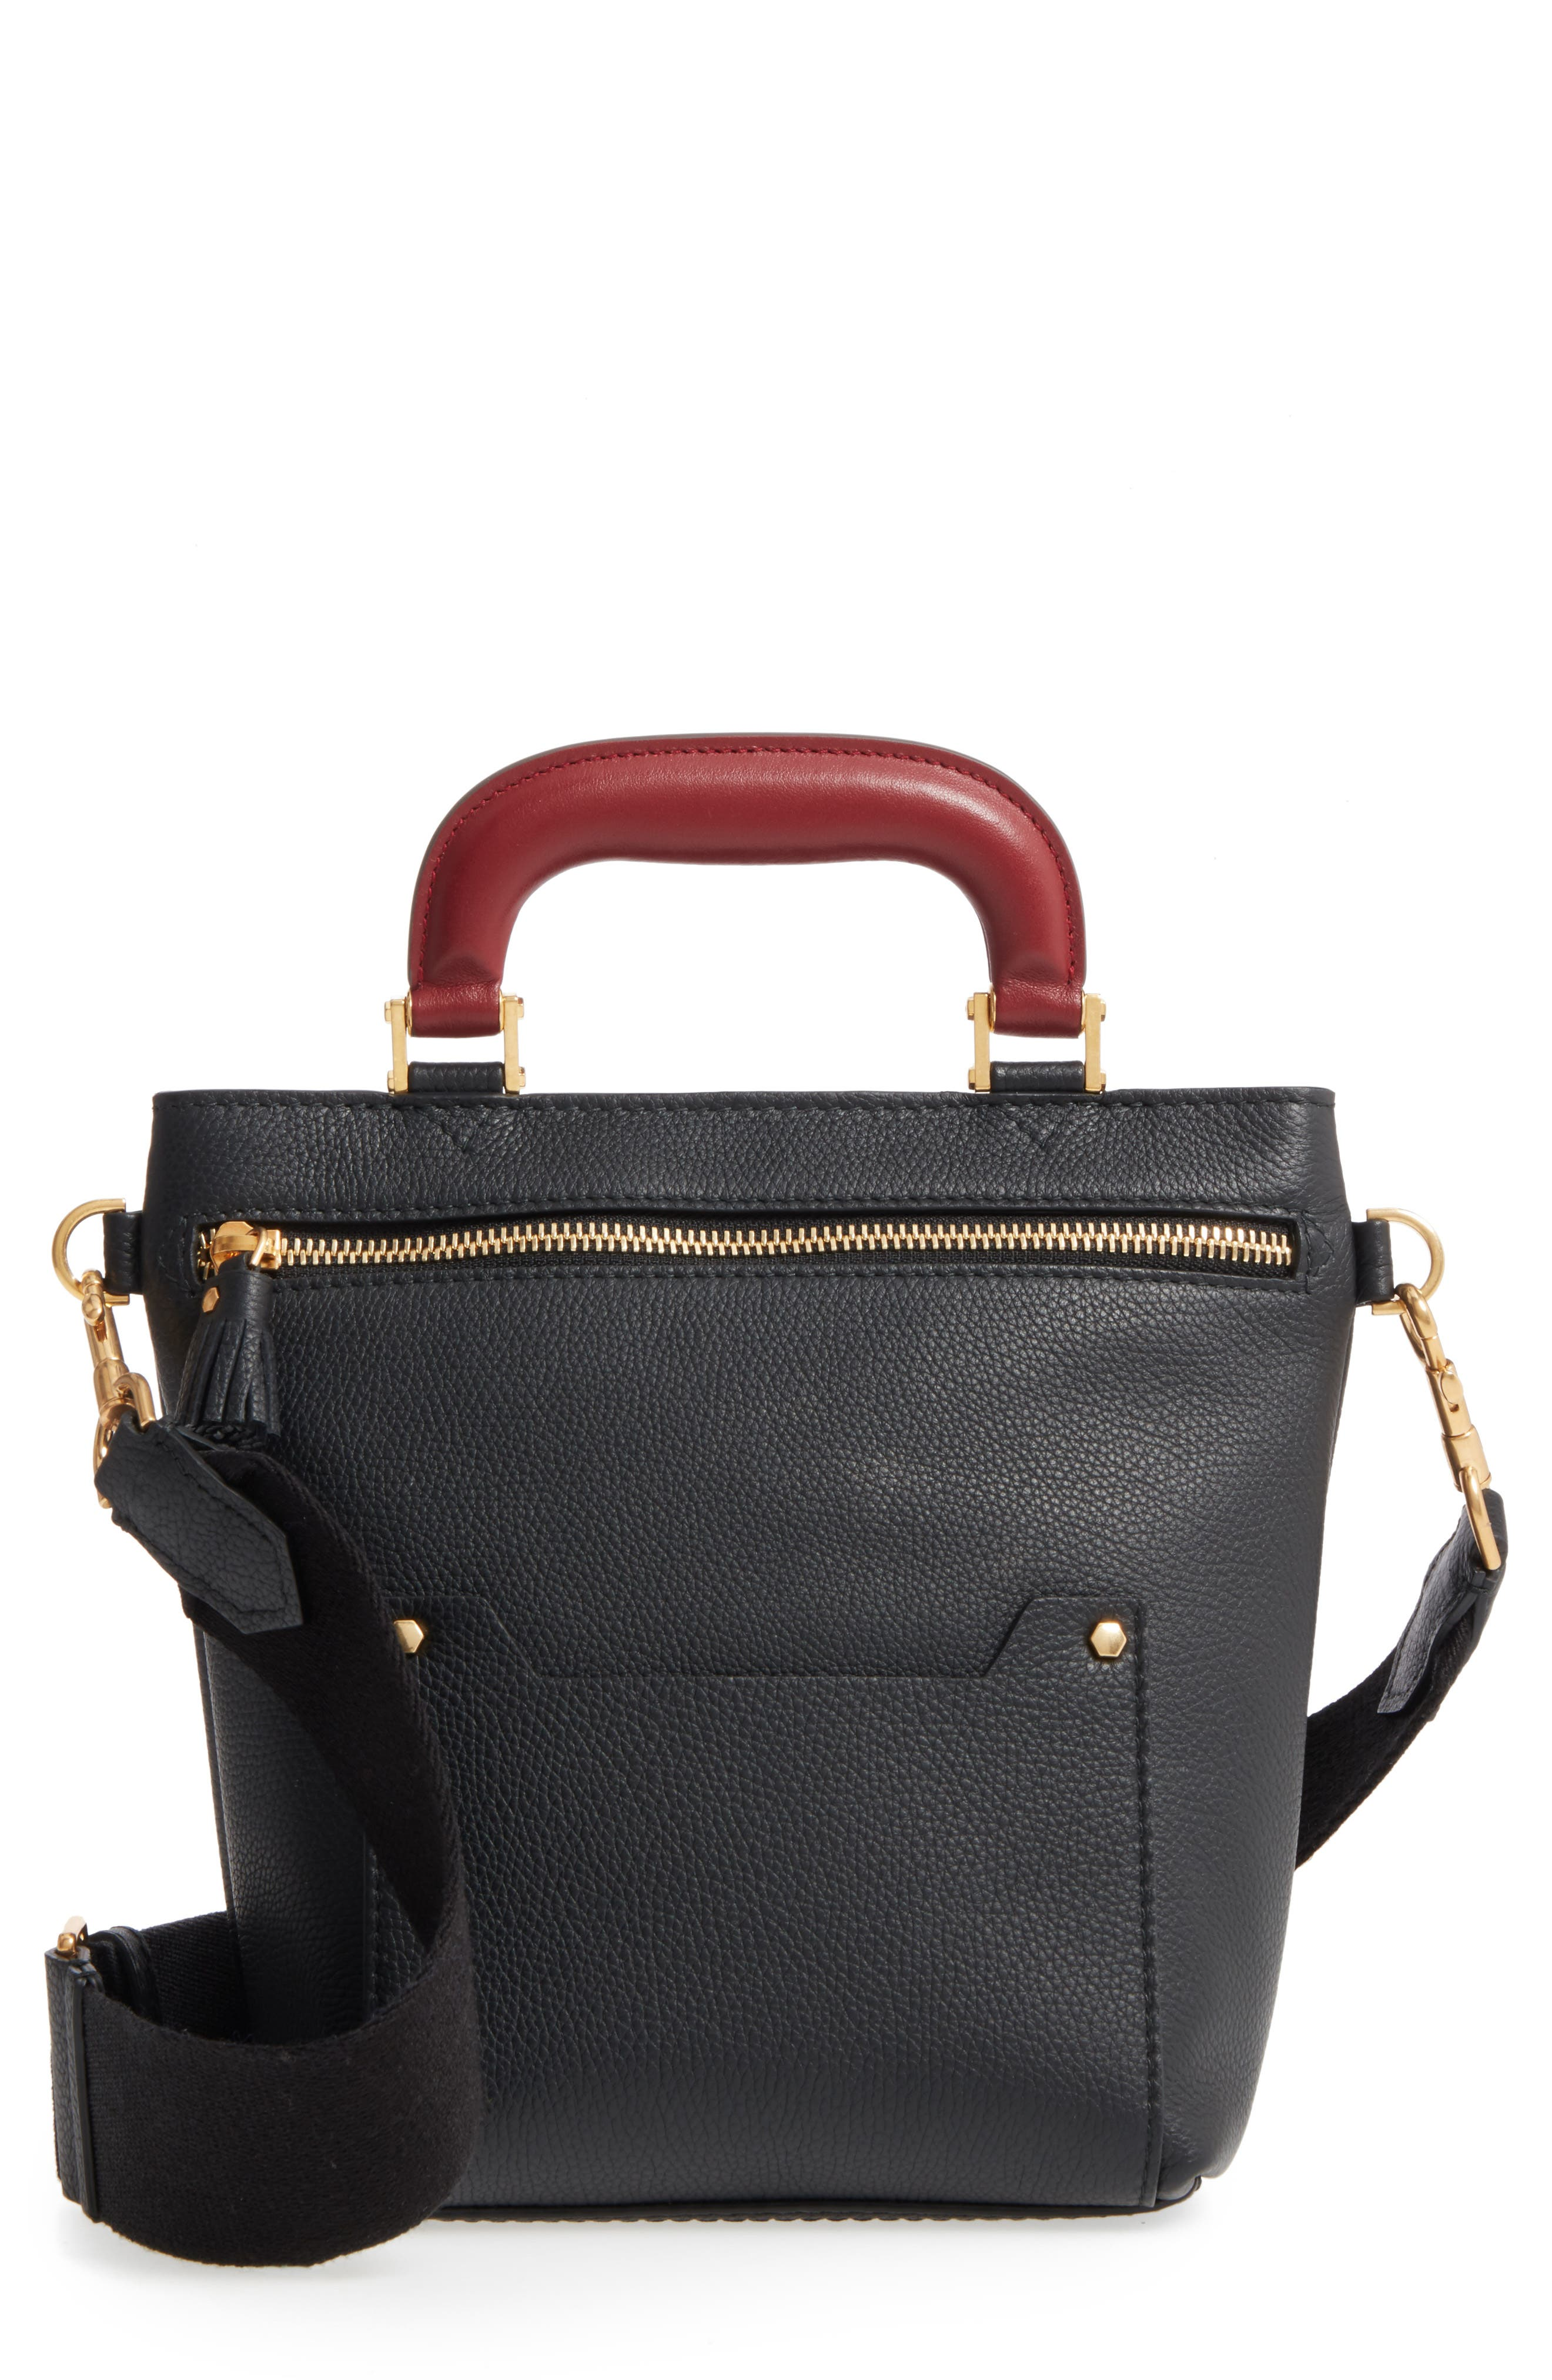 Anya Hindmarch Mini Orsett Leather Shoulder Bag